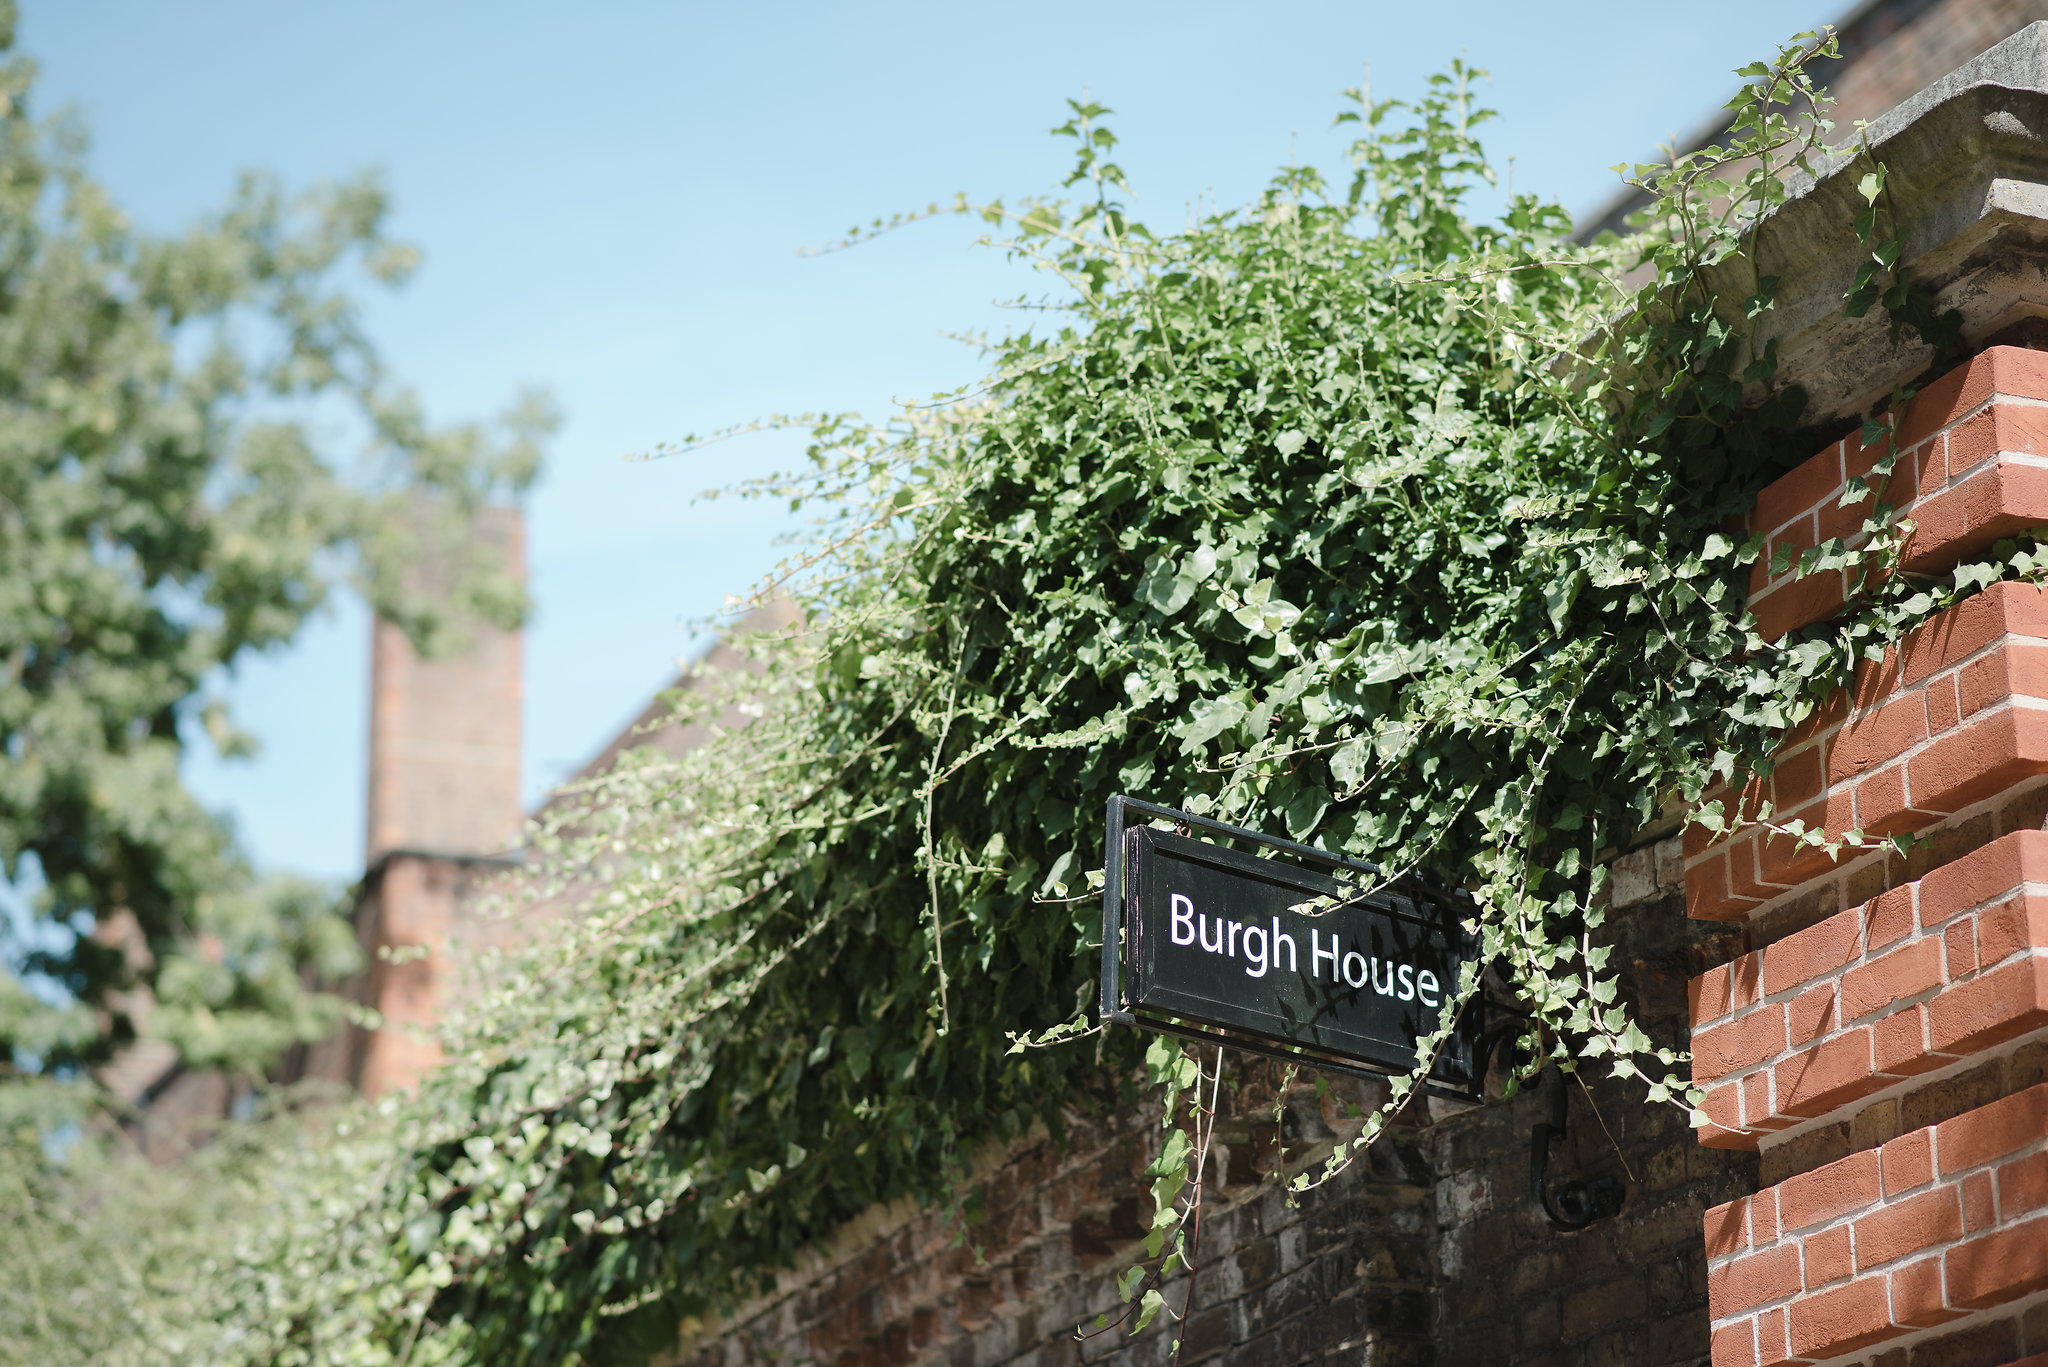 Burgh_House_Hamptead_Museum_Prince_Albert_Camden_Emma_Hare_Photography_2.jpg